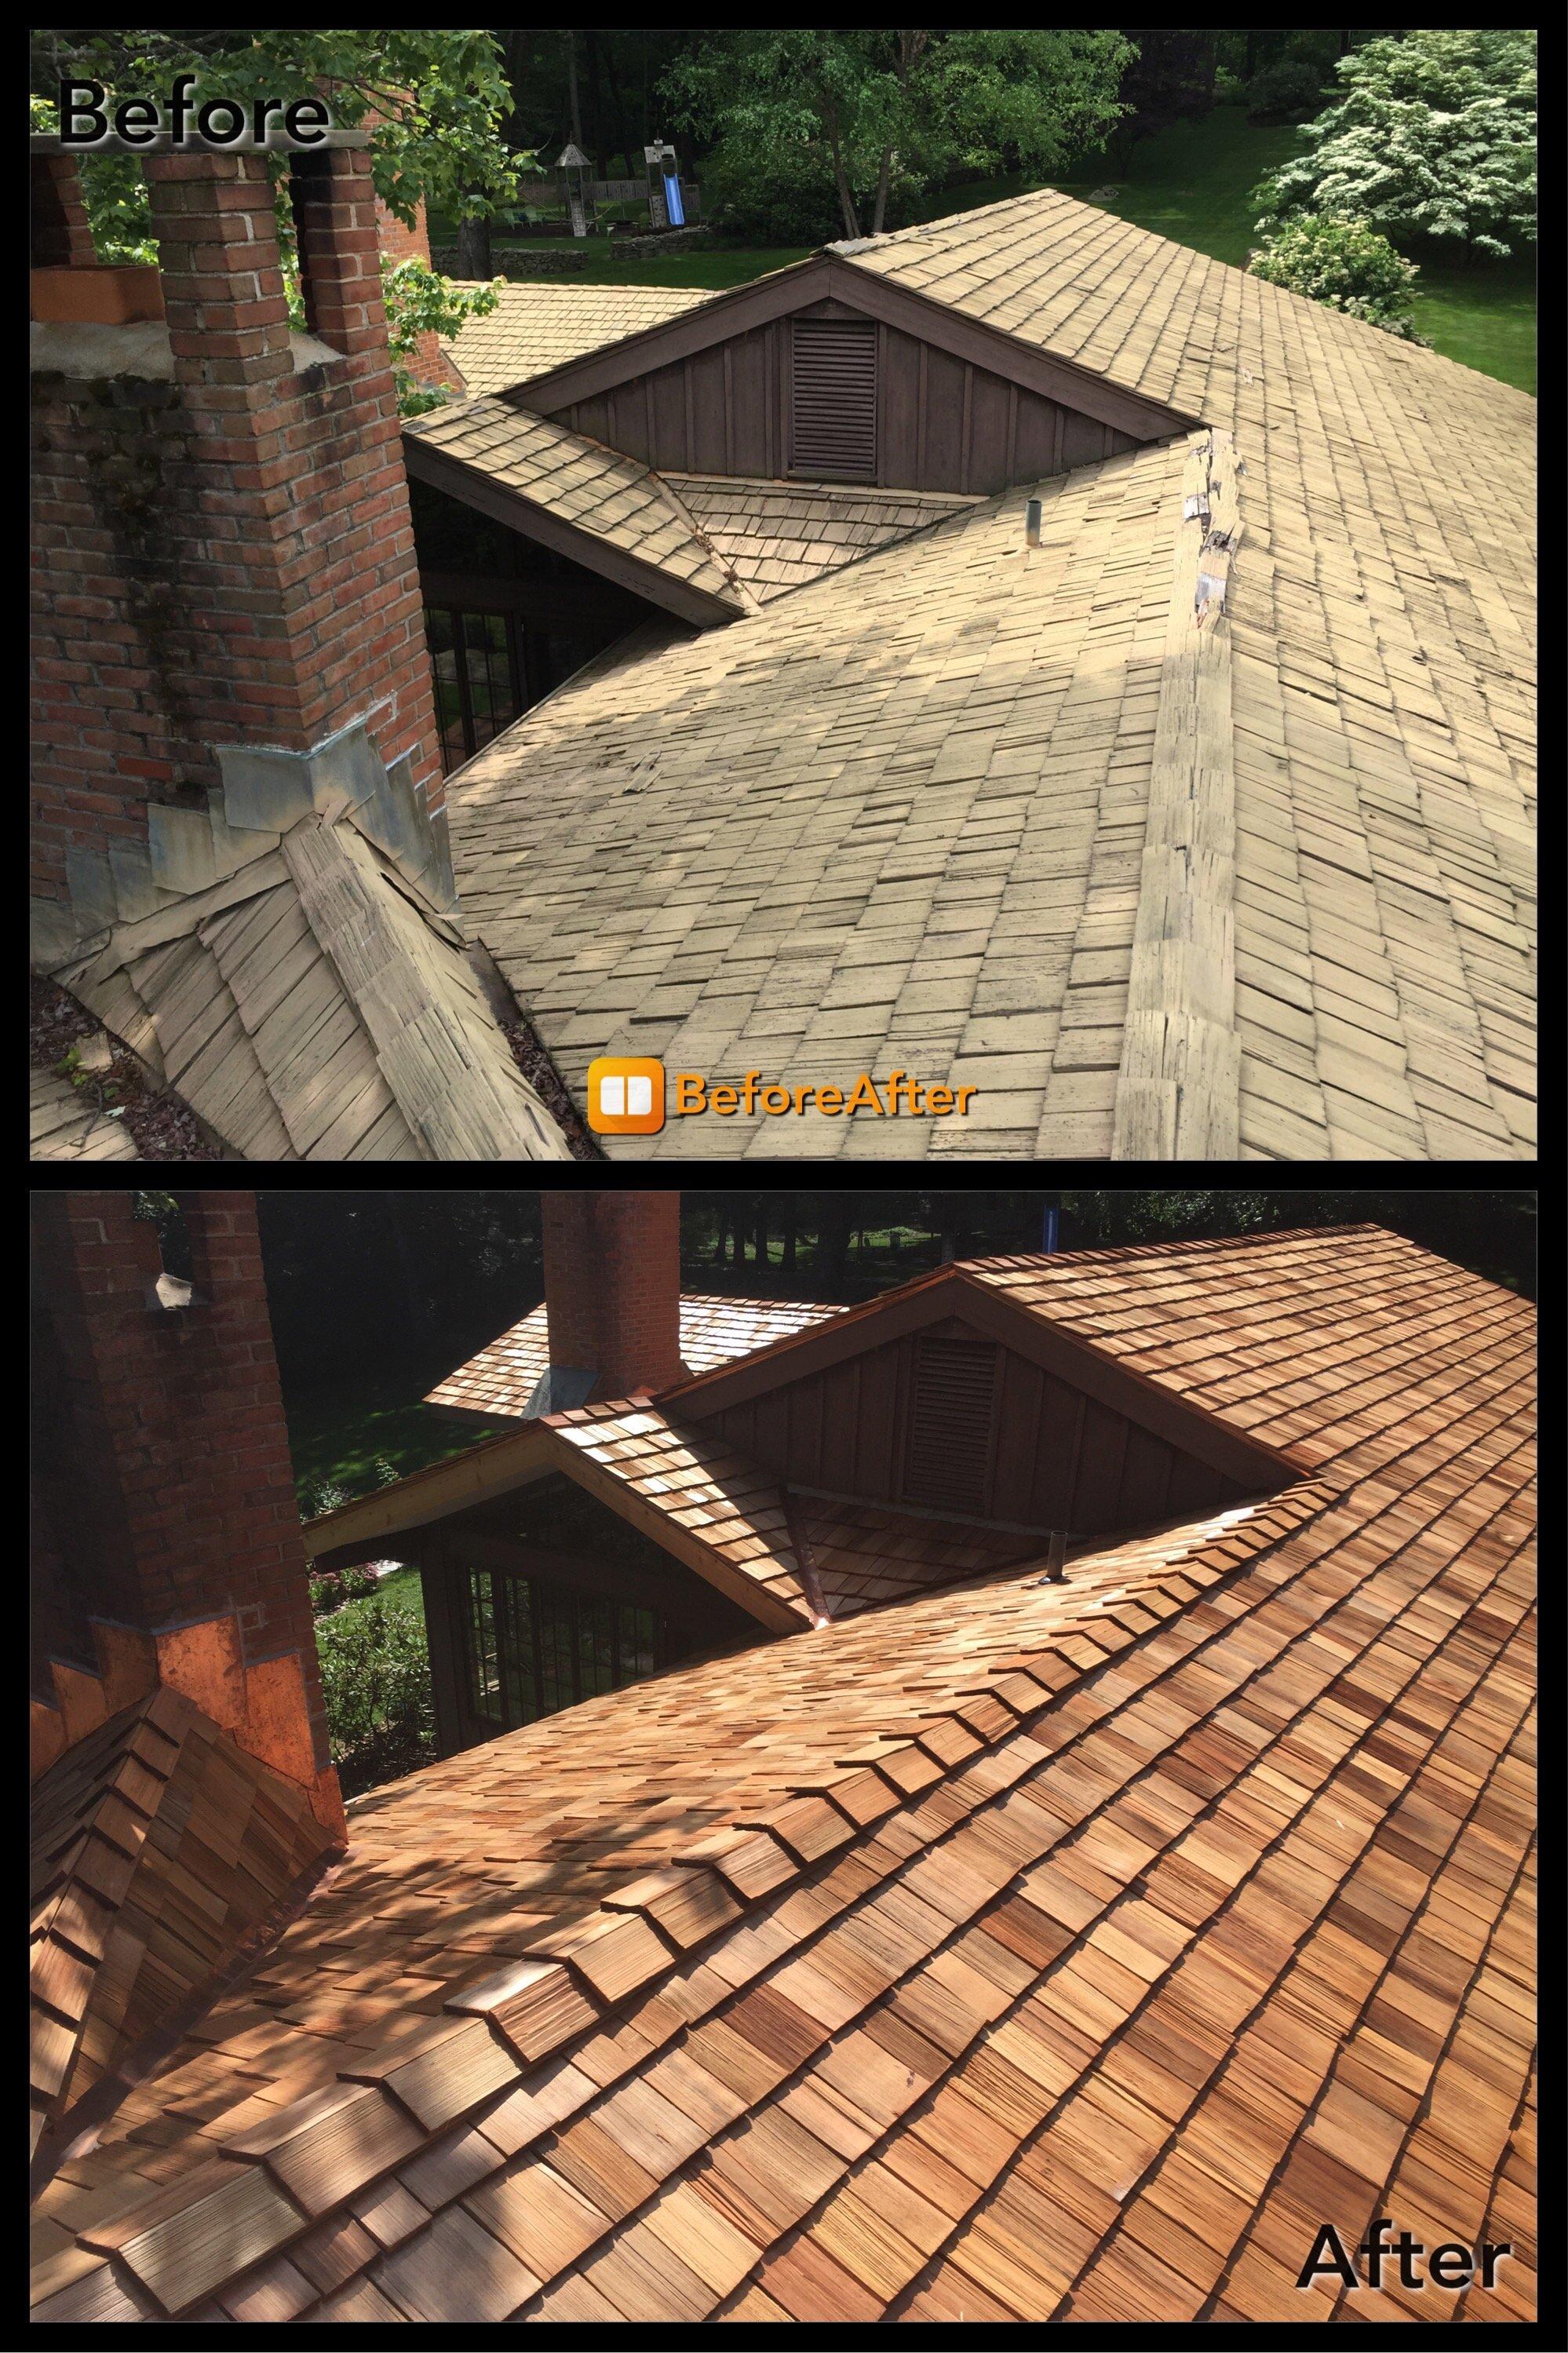 roofing contractors Yorktown, NY